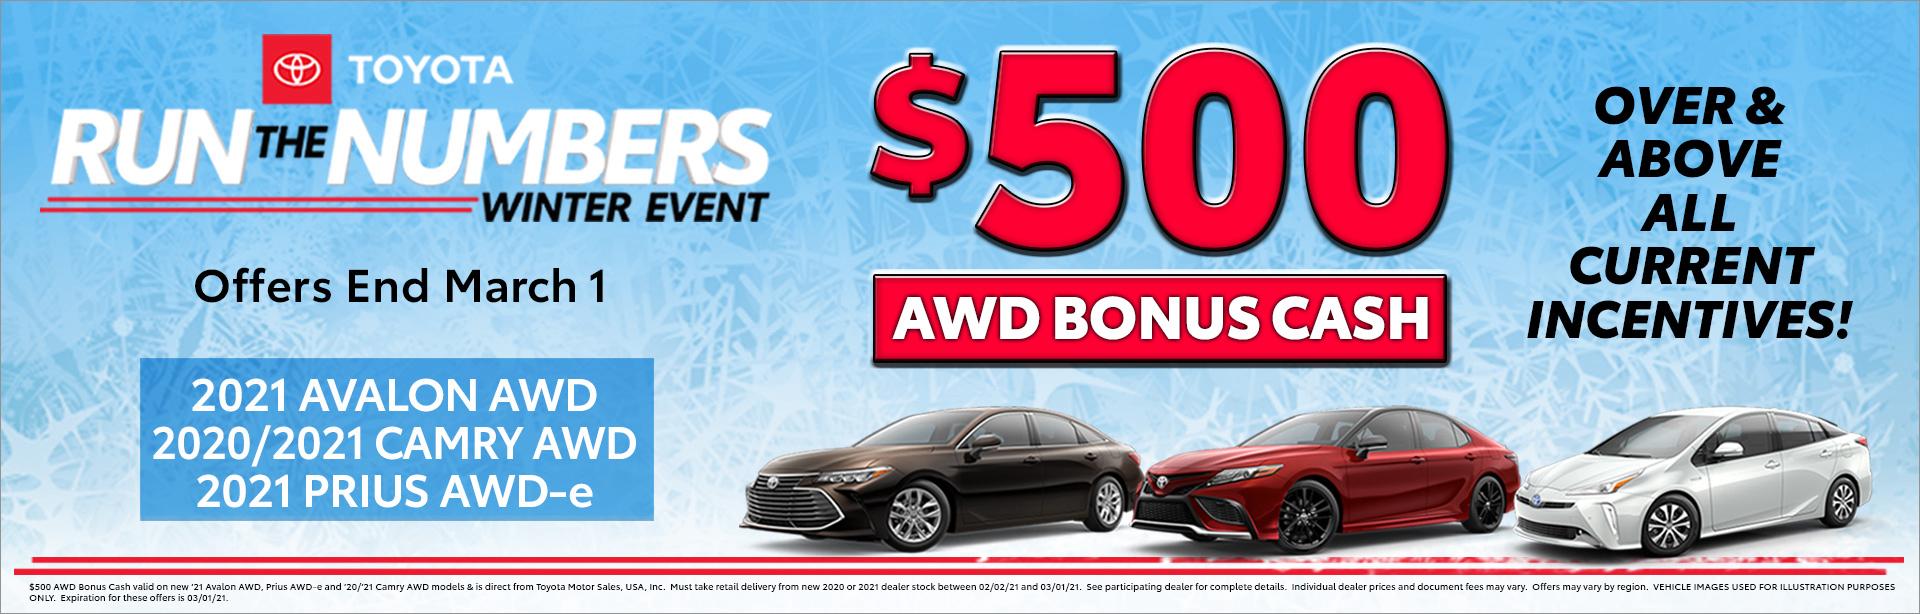 02-21_01_Cincinnati-February-2021-CIN-AWD-Bonus_1920x614_23b7_Avalon-Camry-Prius_O_xta.jpeg